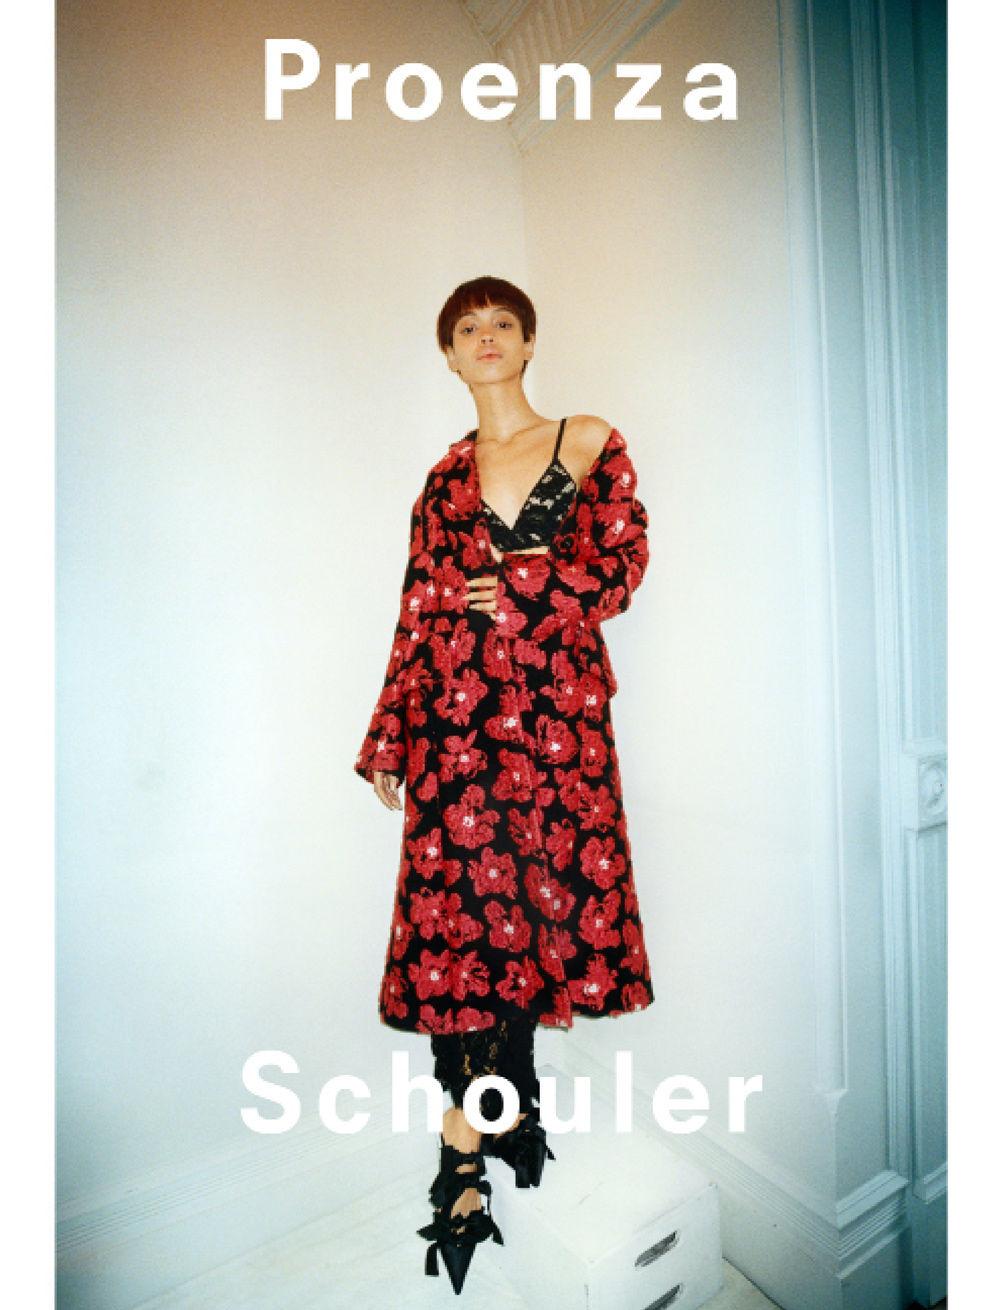 proenza schouler spring 2018 ad campaign